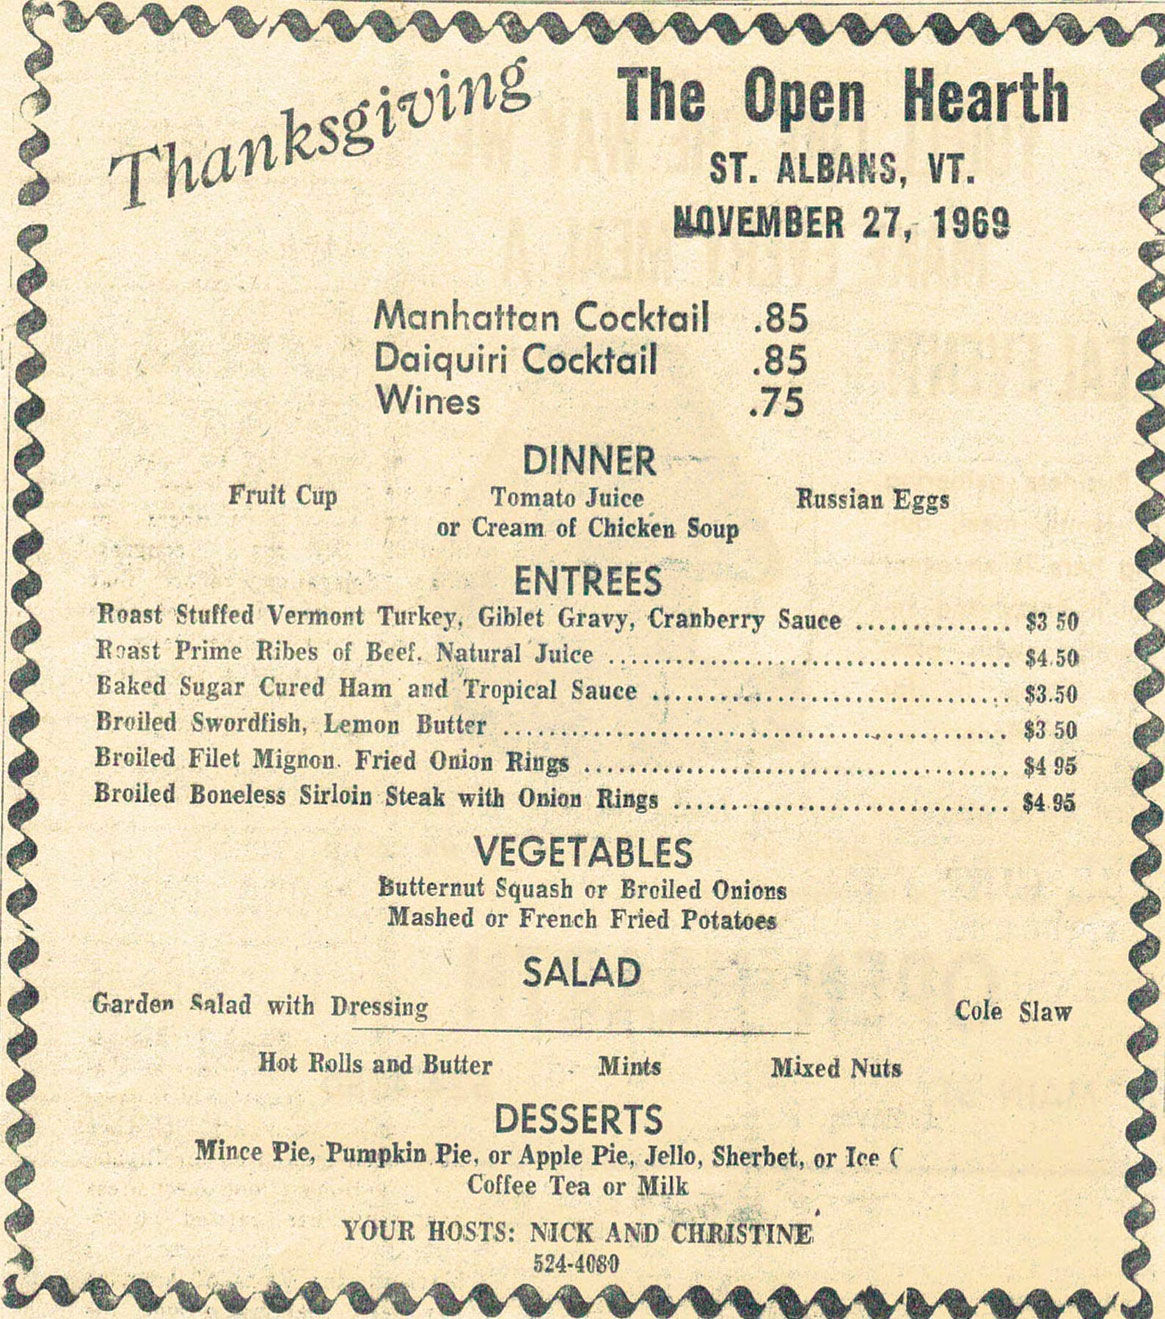 Thanksgiving menu at the Open Hearth Restaurant